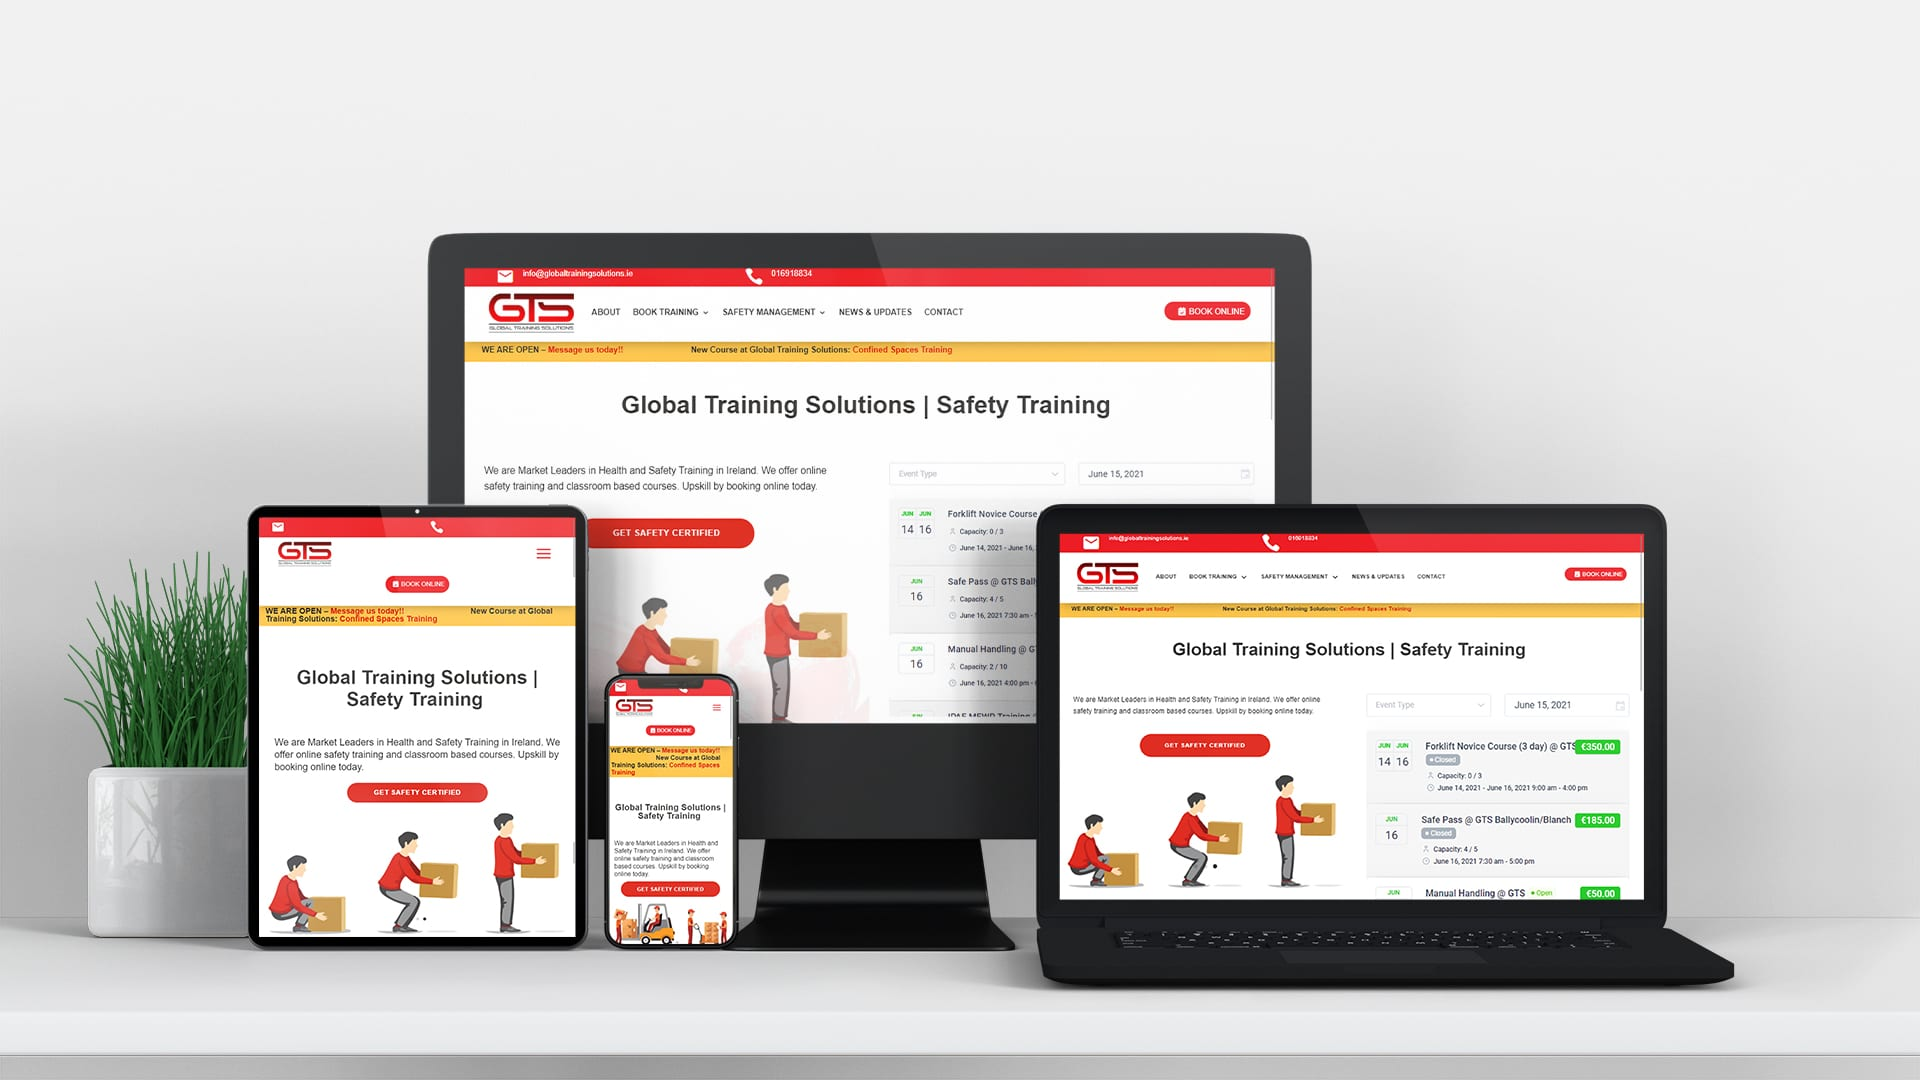 global training solutions online safety trainging Ireland